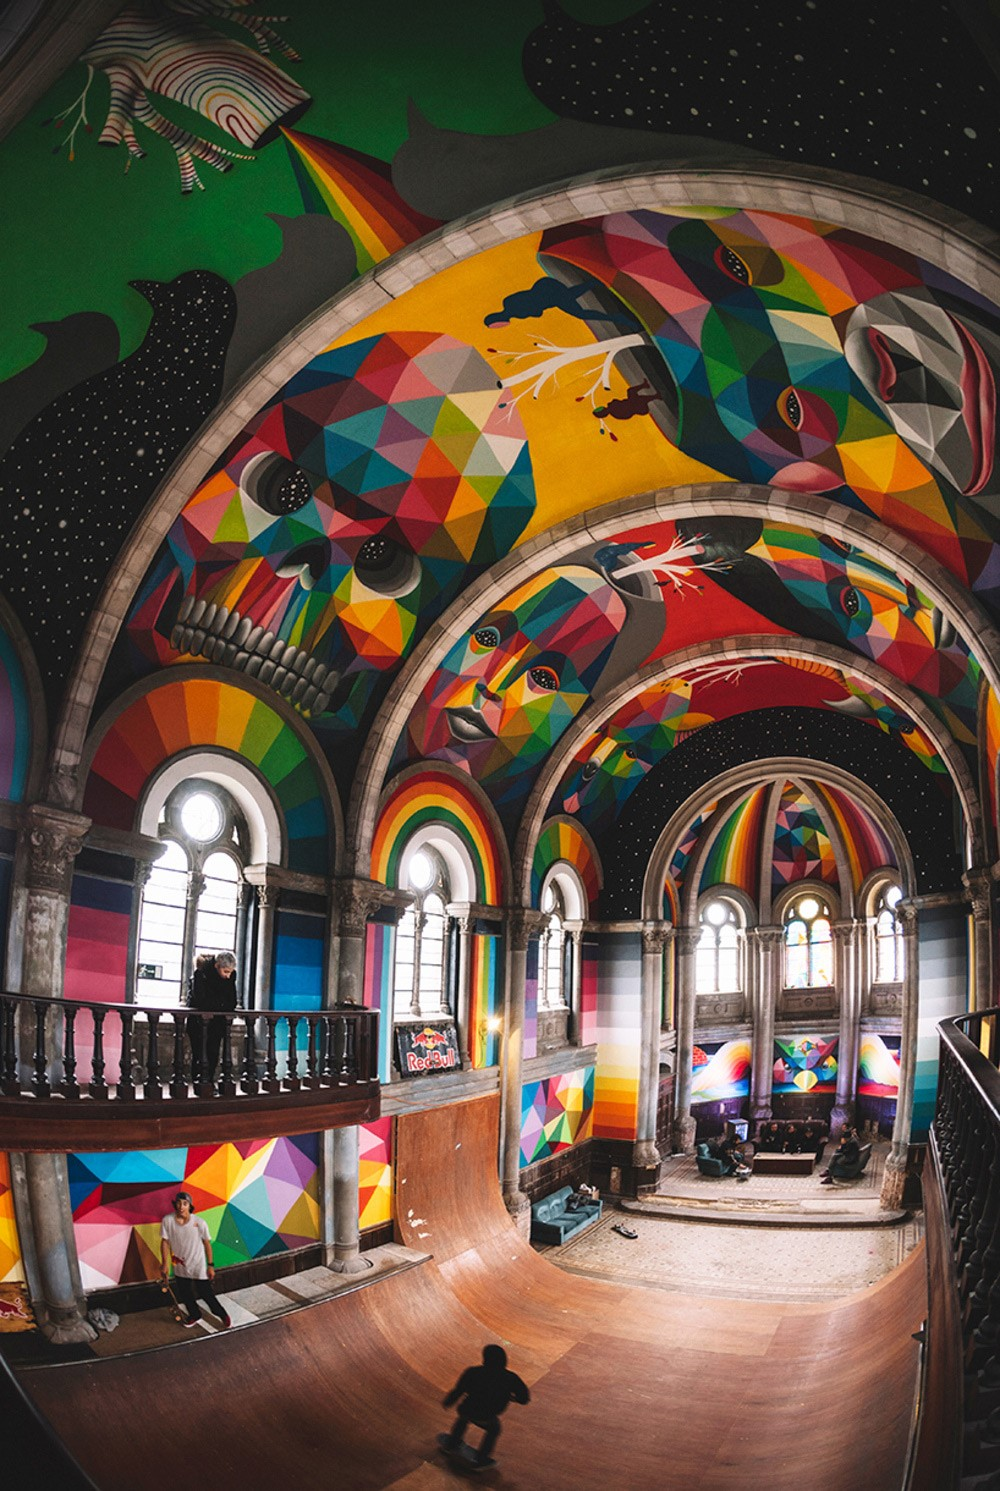 kaos temple skate espagne église